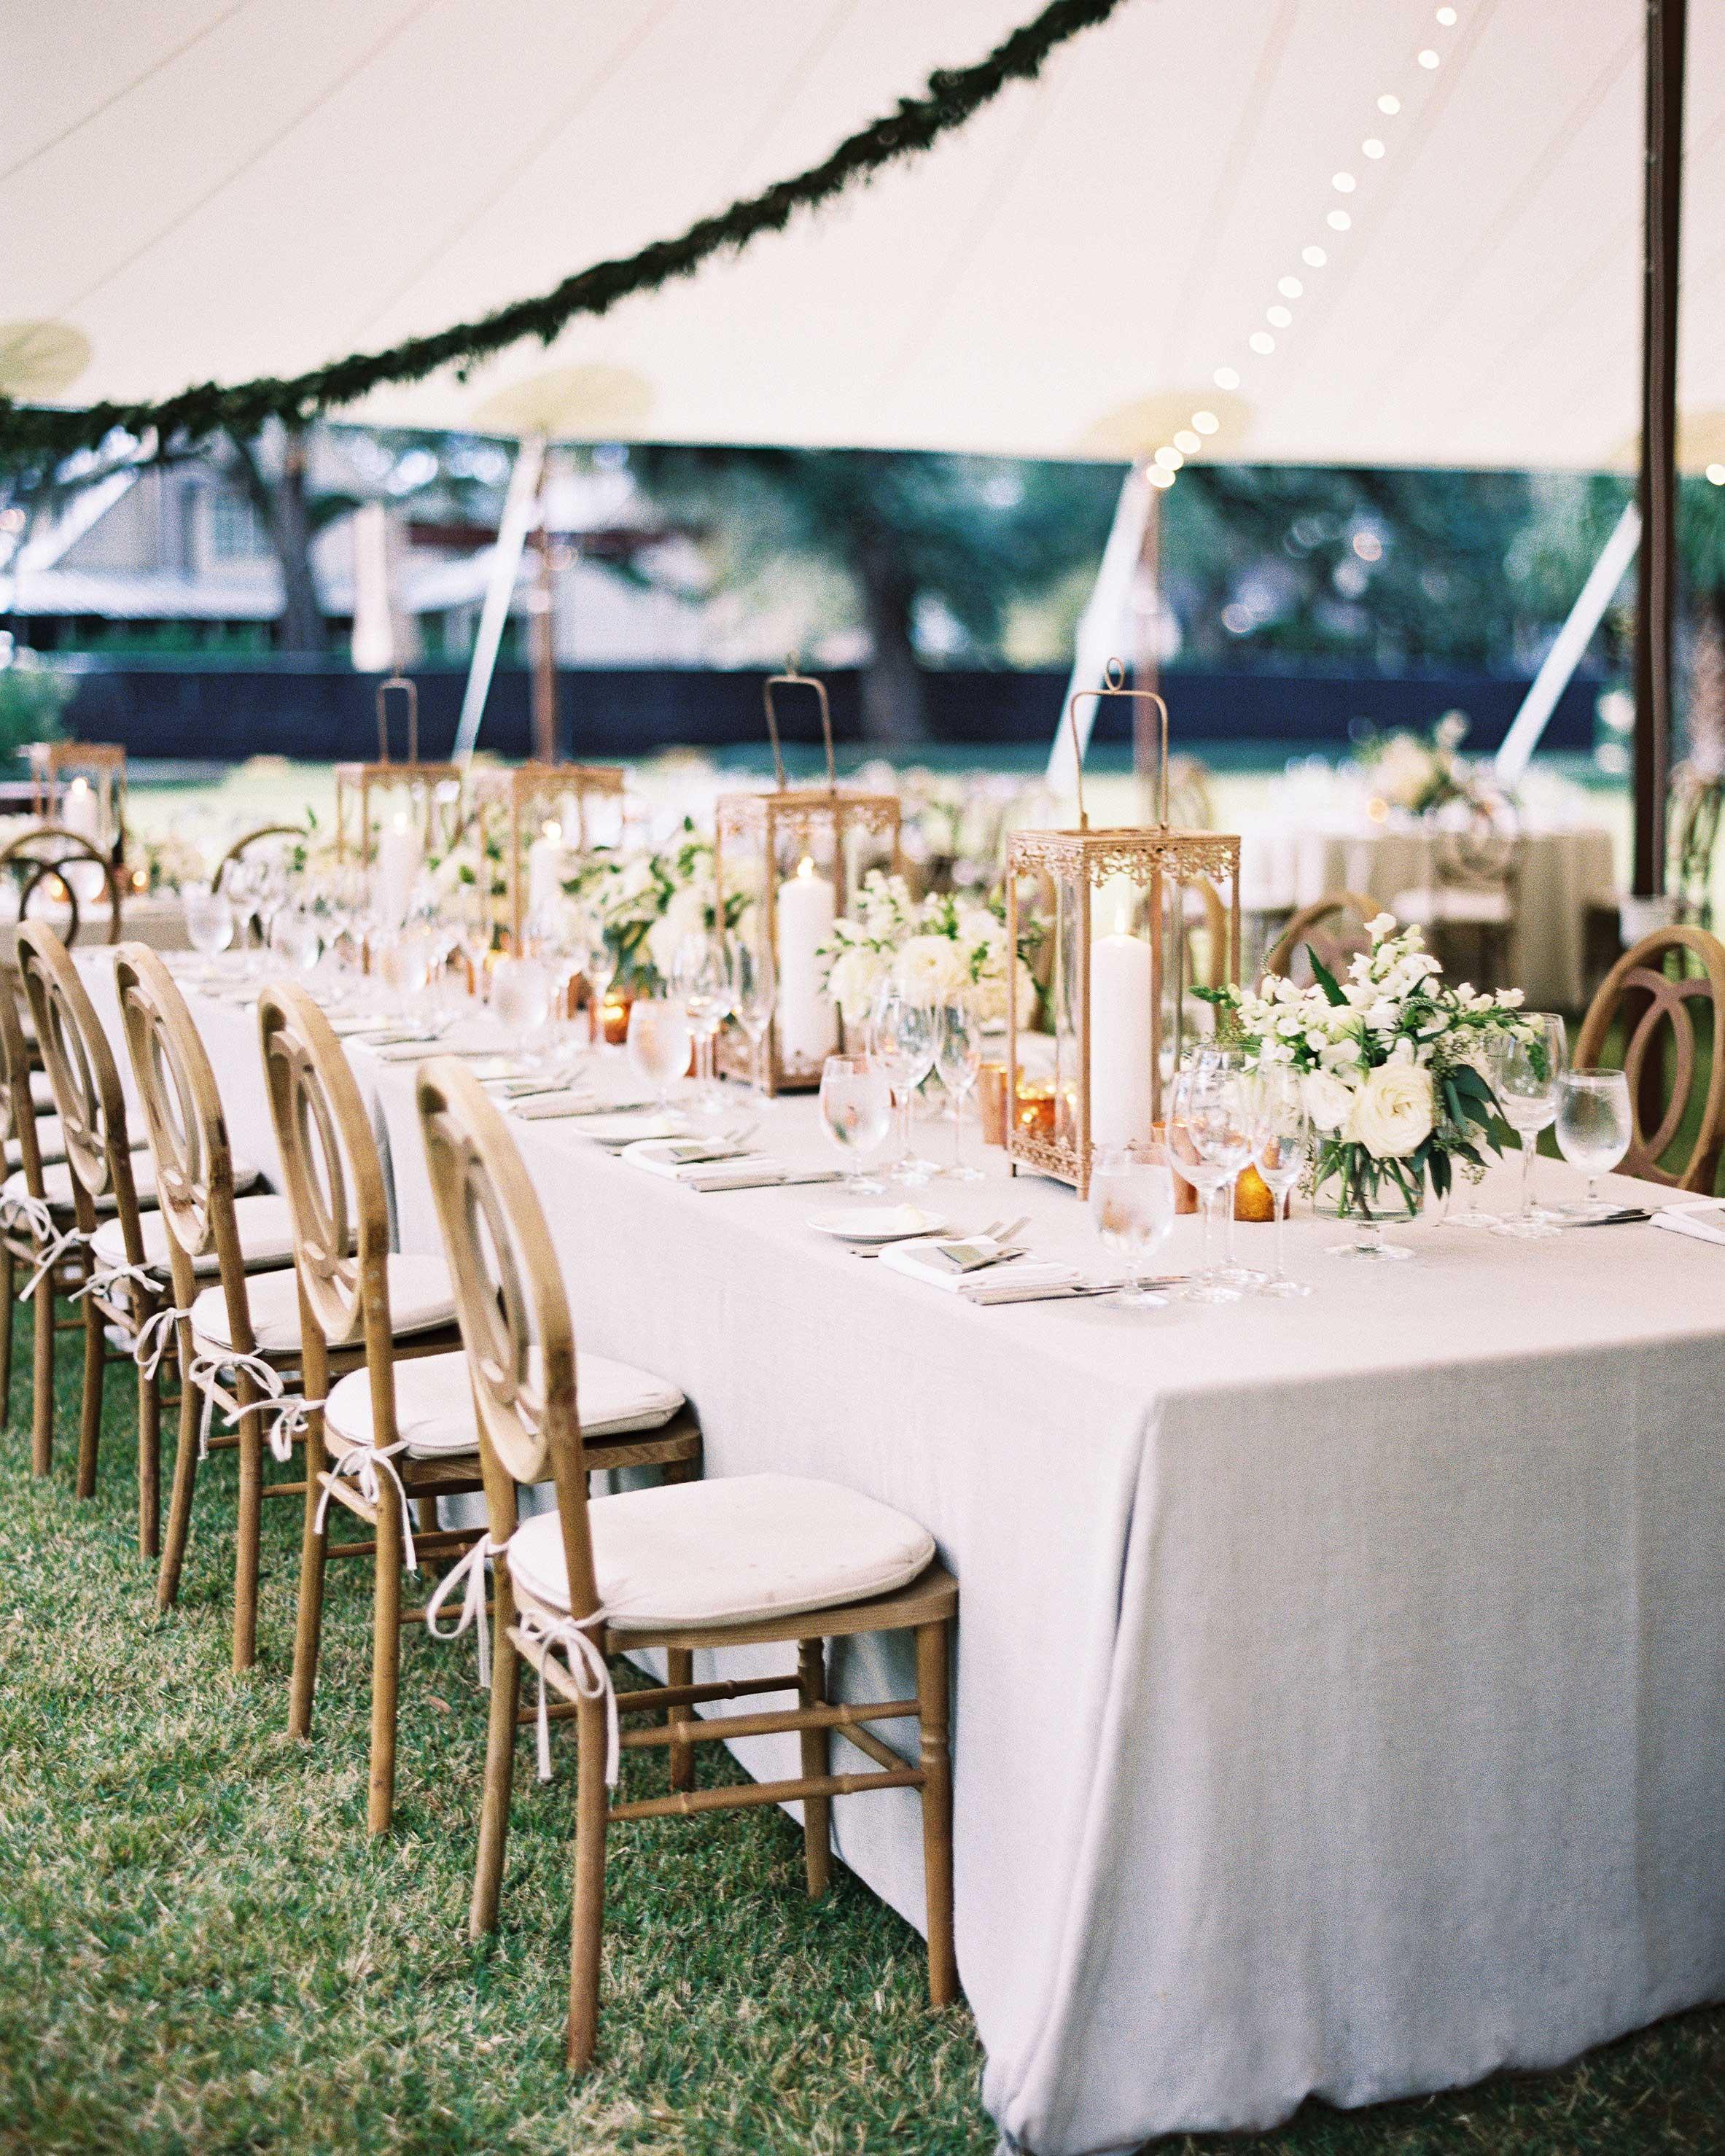 taylor-john-wedding-tent-table-75-s113035-0616.jpg